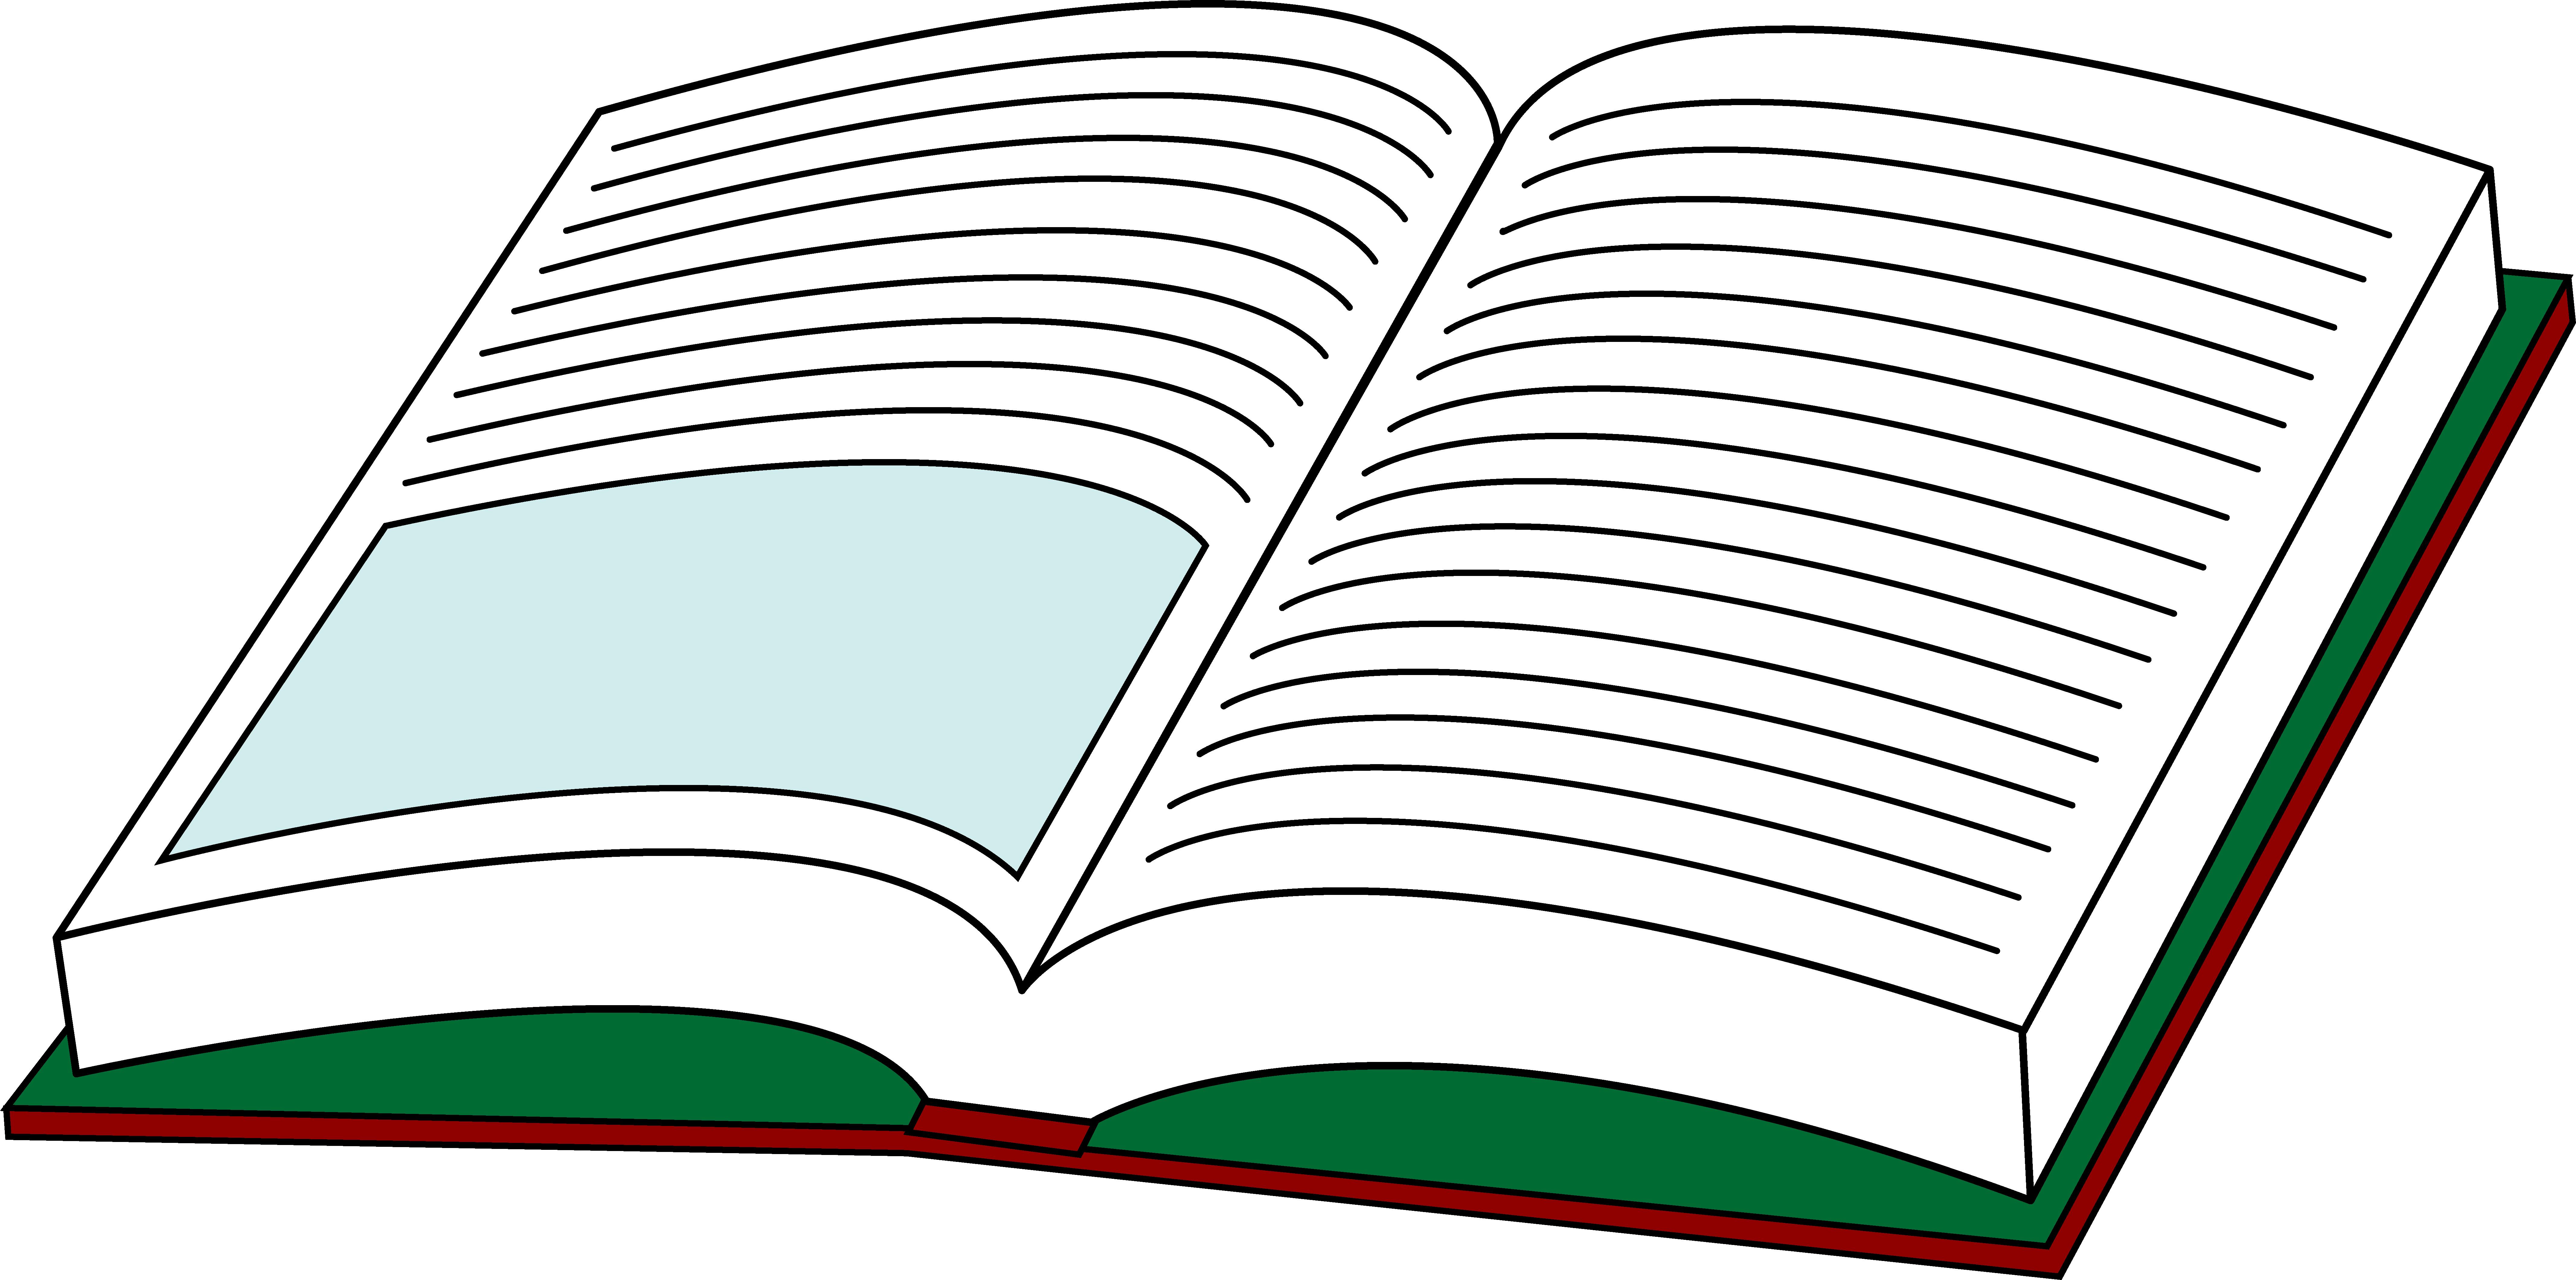 open book cartoon clipart - photo #33